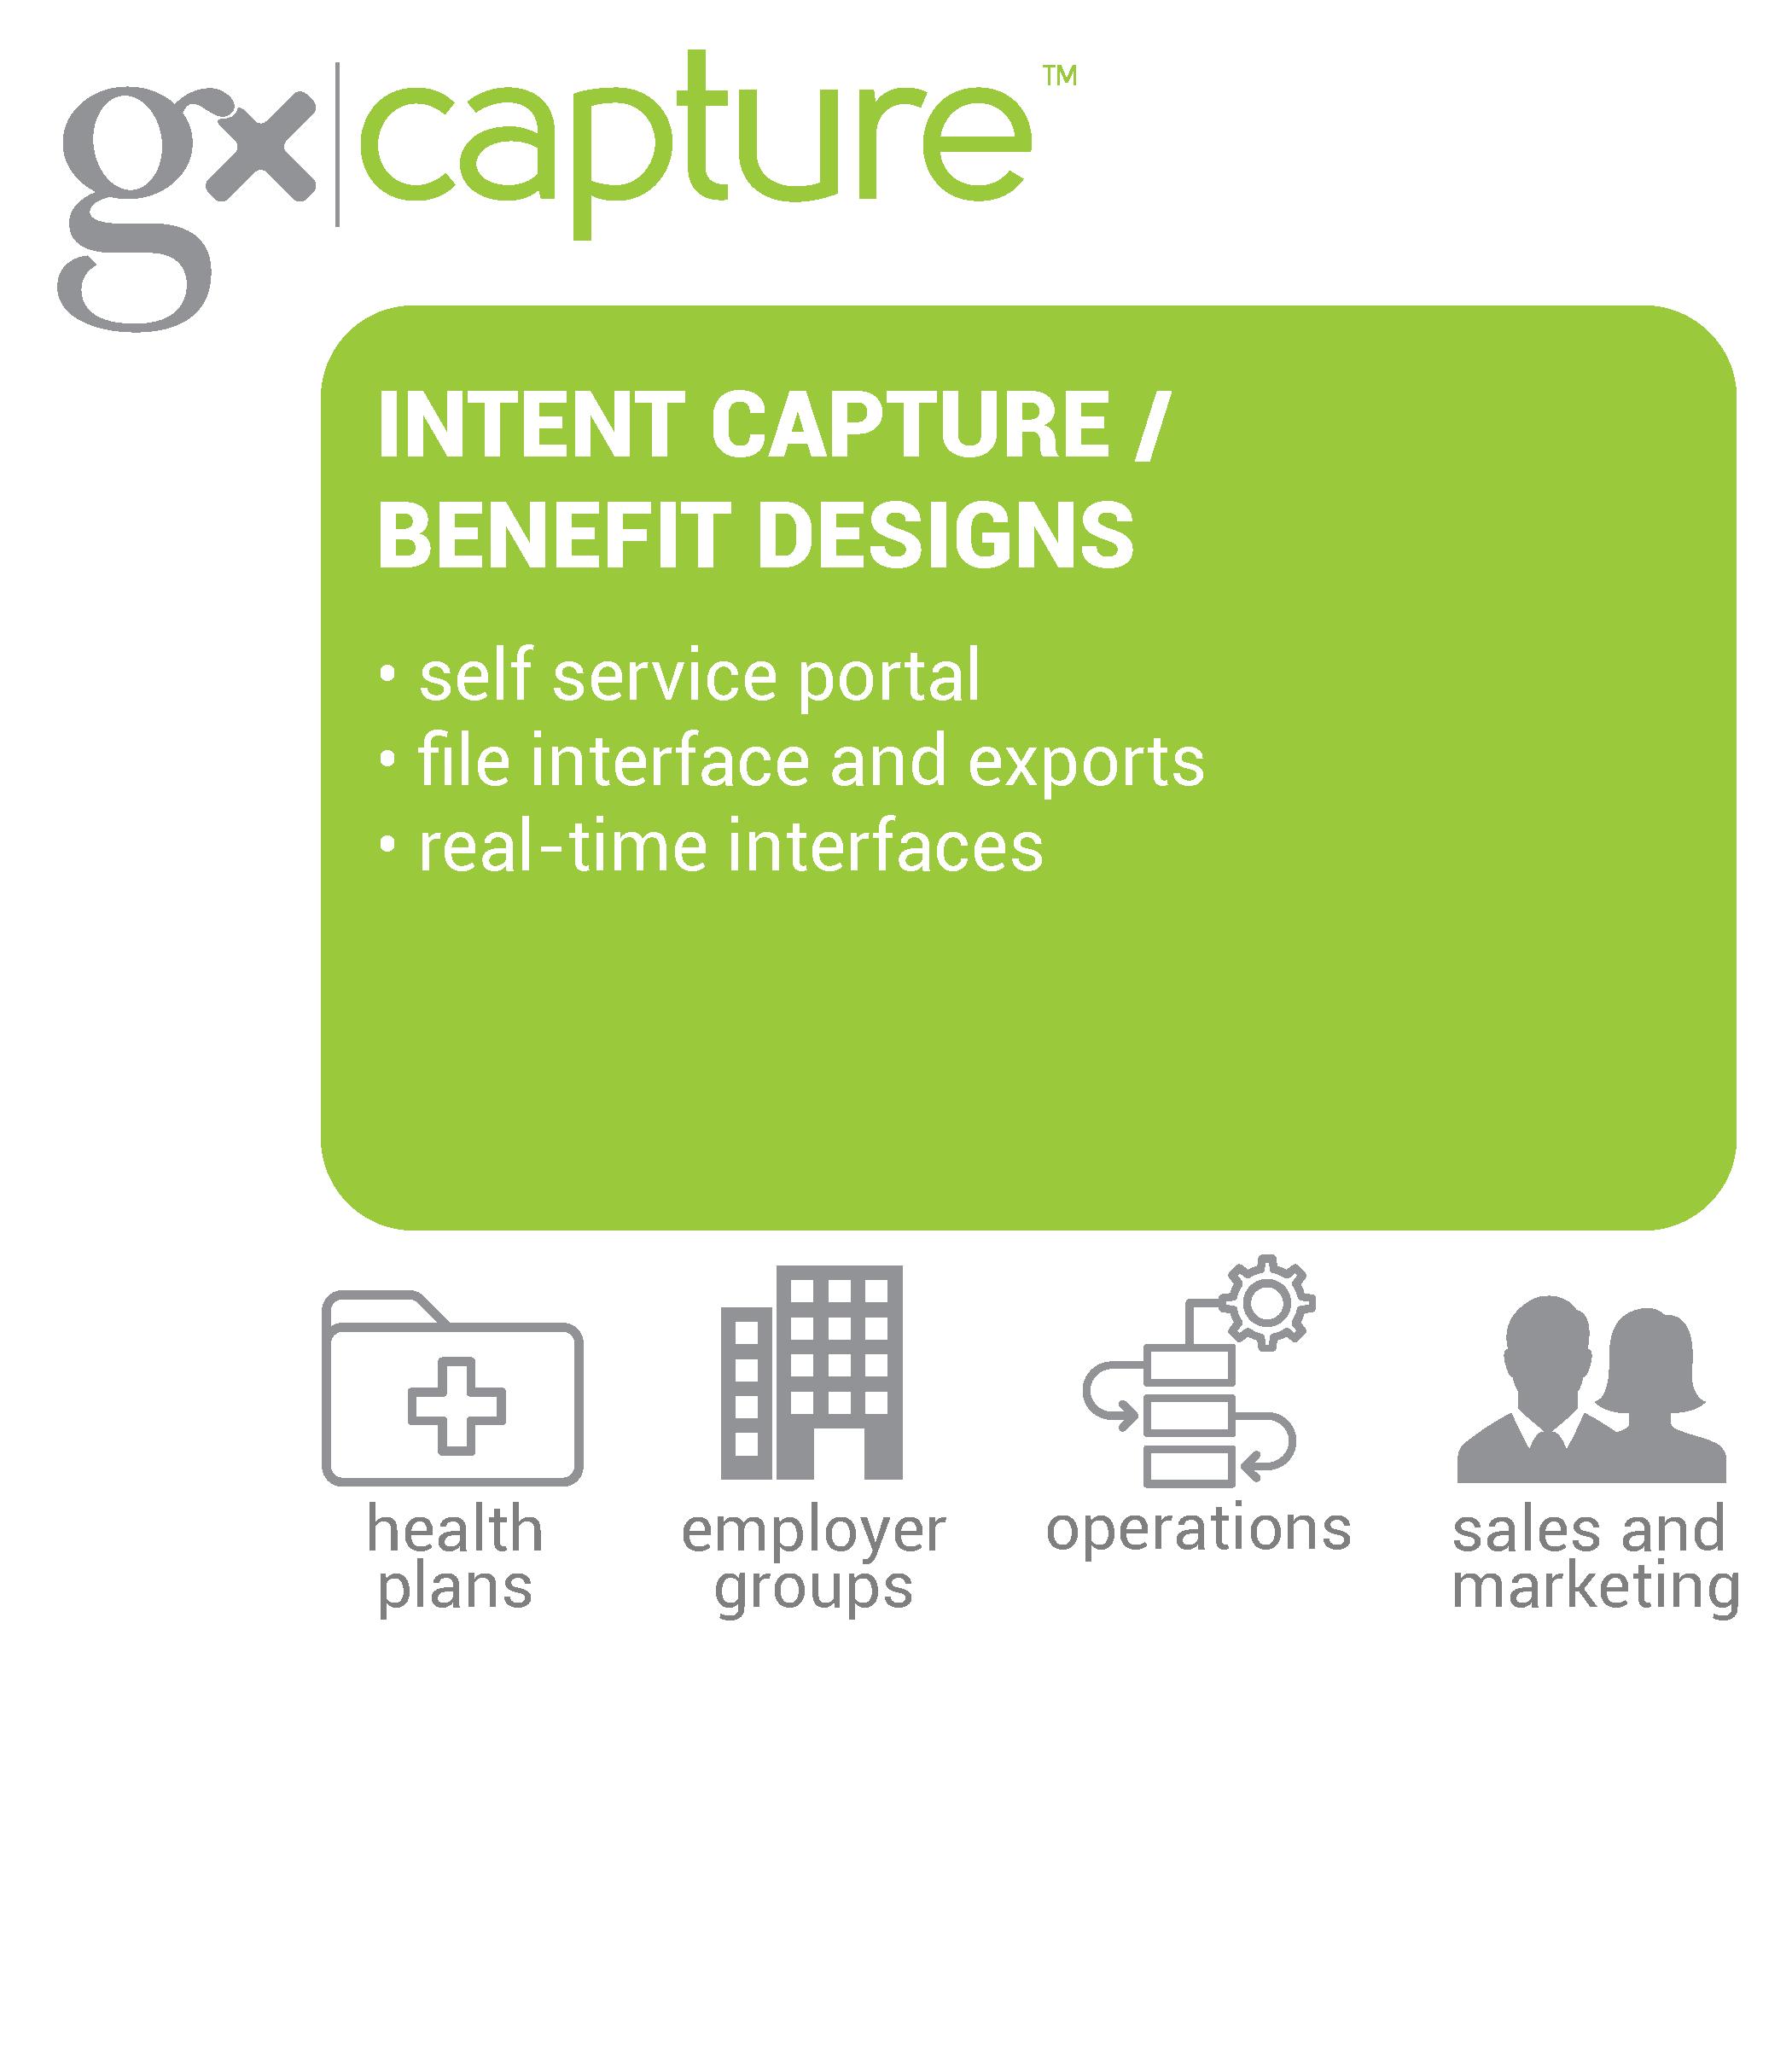 Capture benefit designs